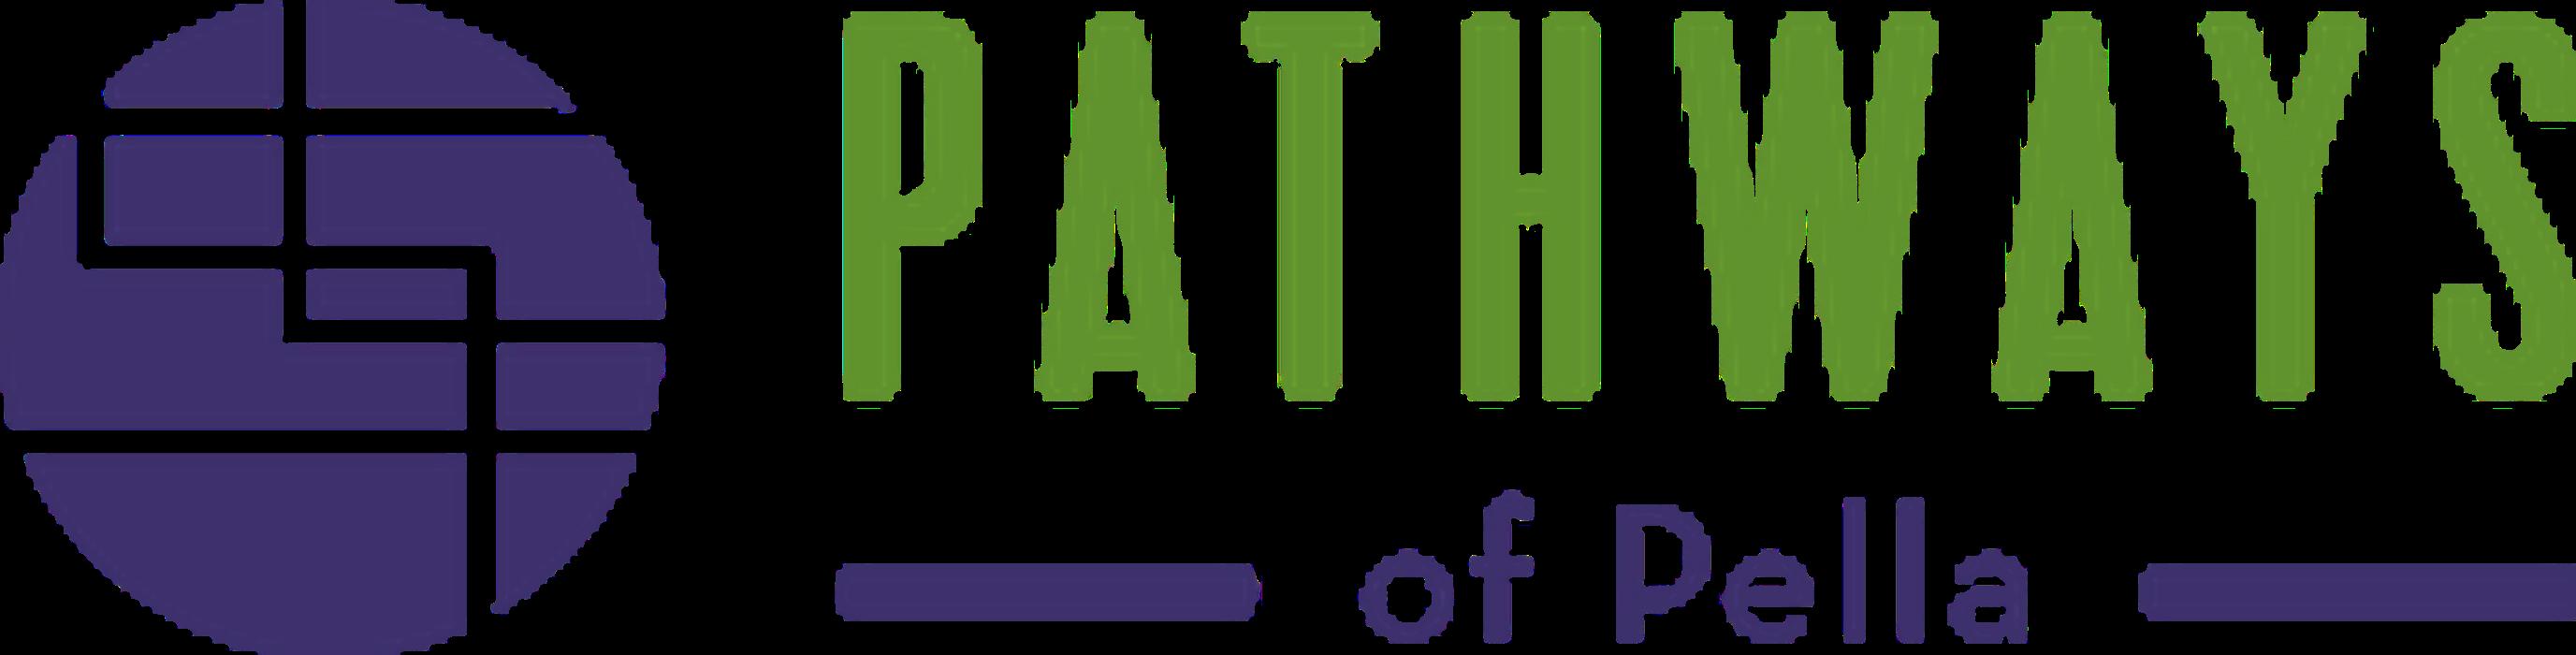 Pathways of Pella - Pella, IA